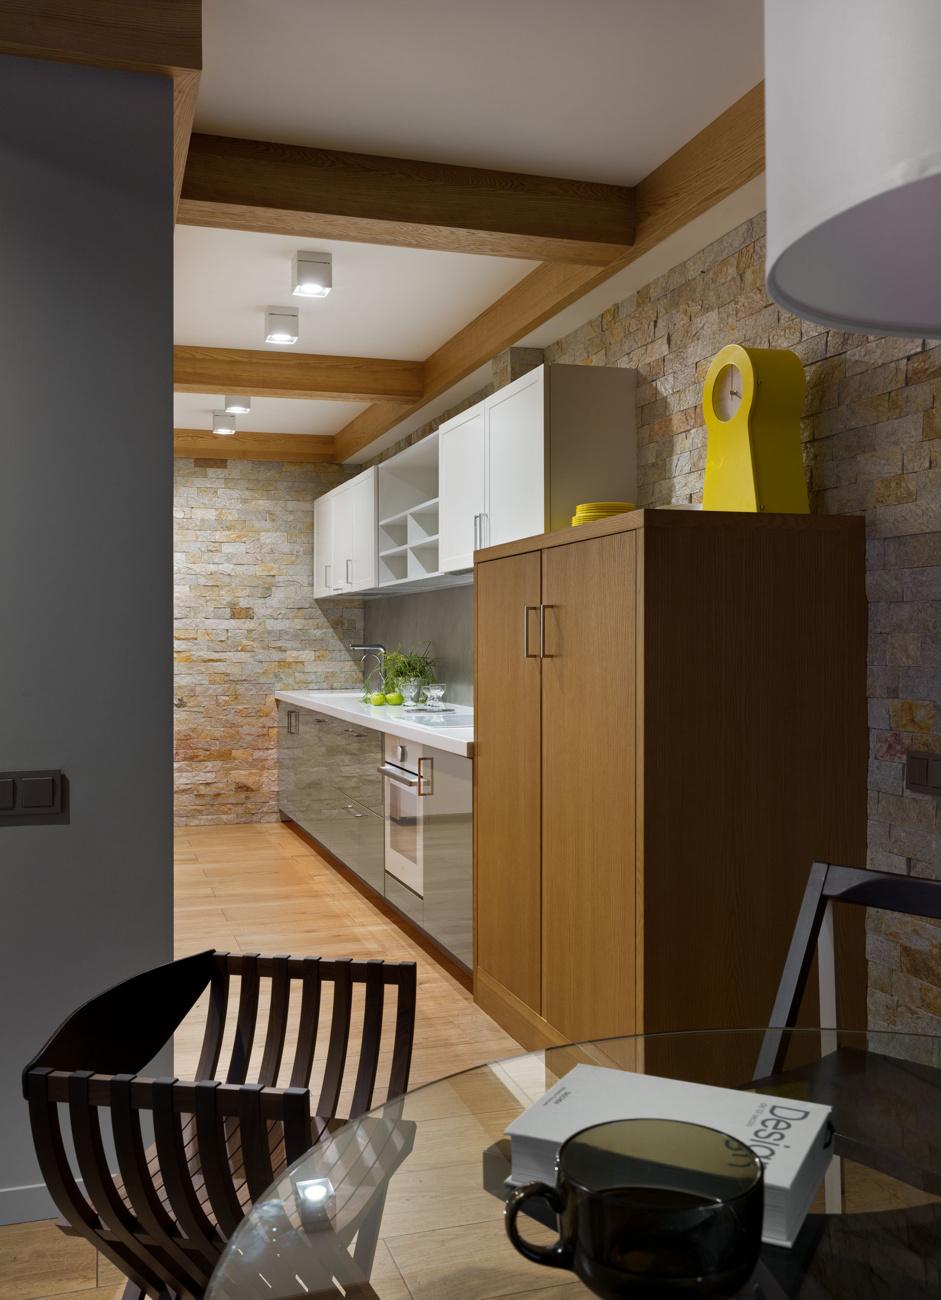 house-lightray-15.jpg